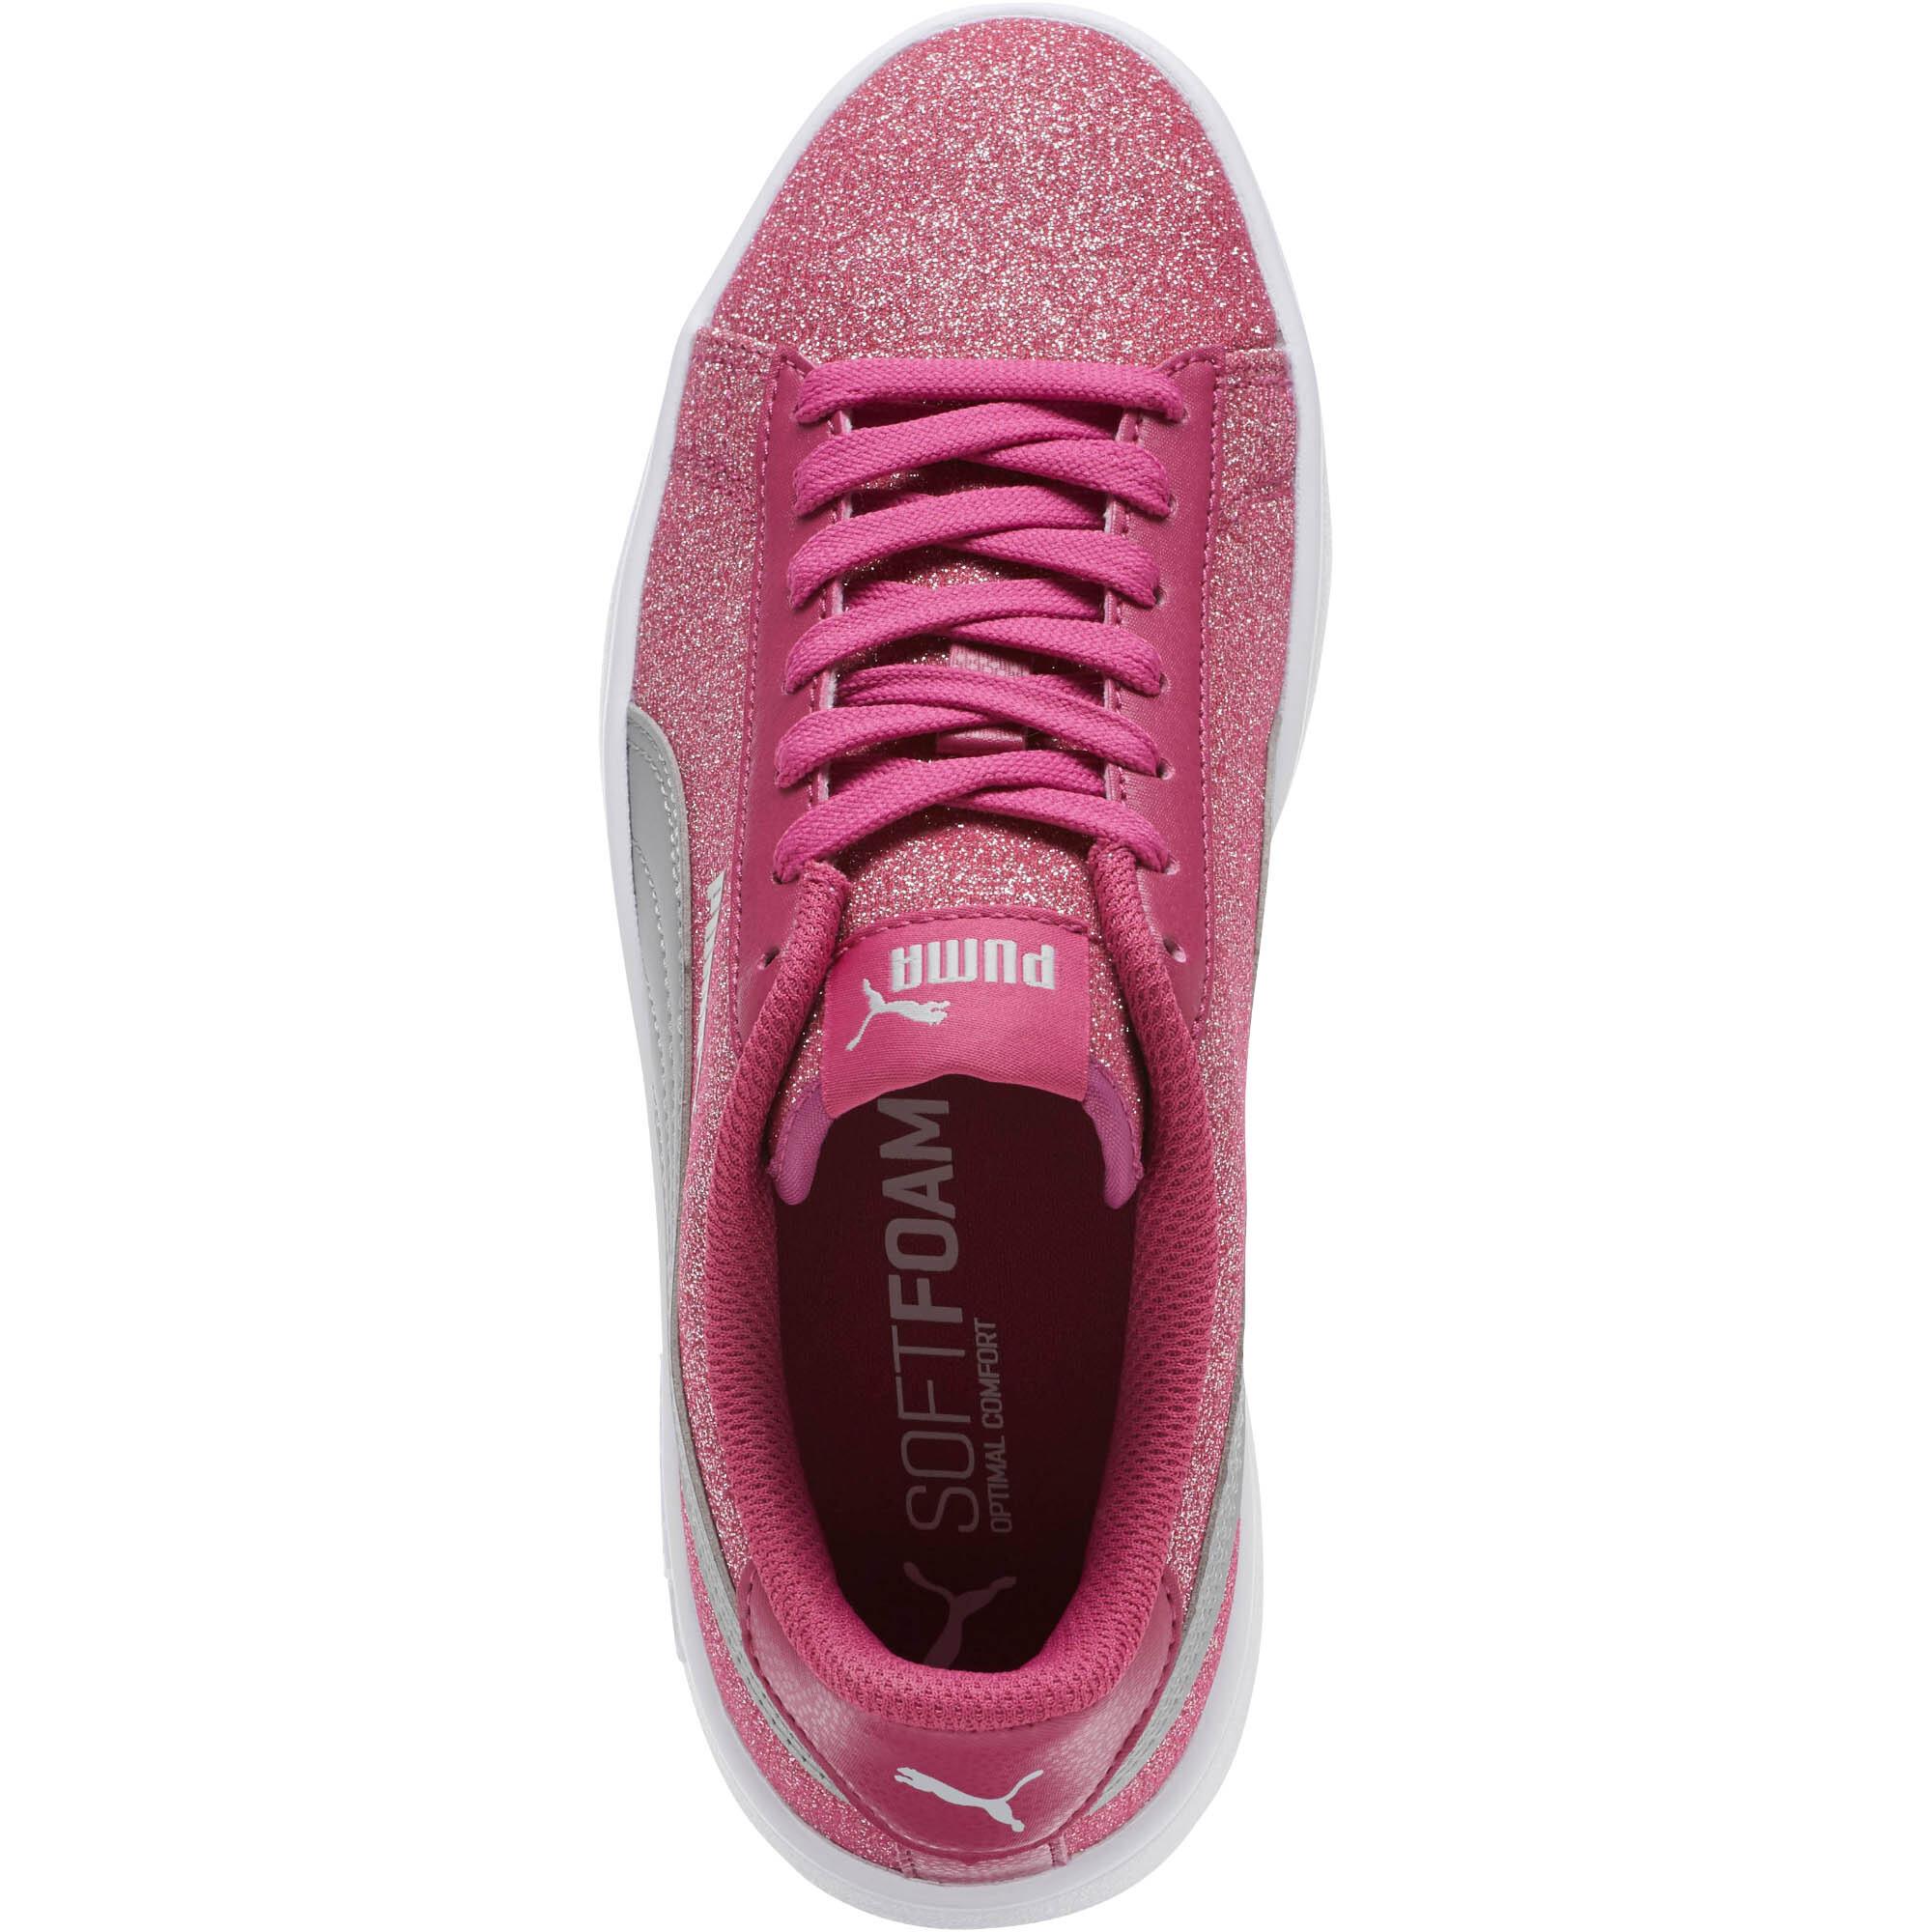 PUMA-Smash-v2-Glitz-Glam-Sneakers-JR-Girls-Shoe-Kids thumbnail 11